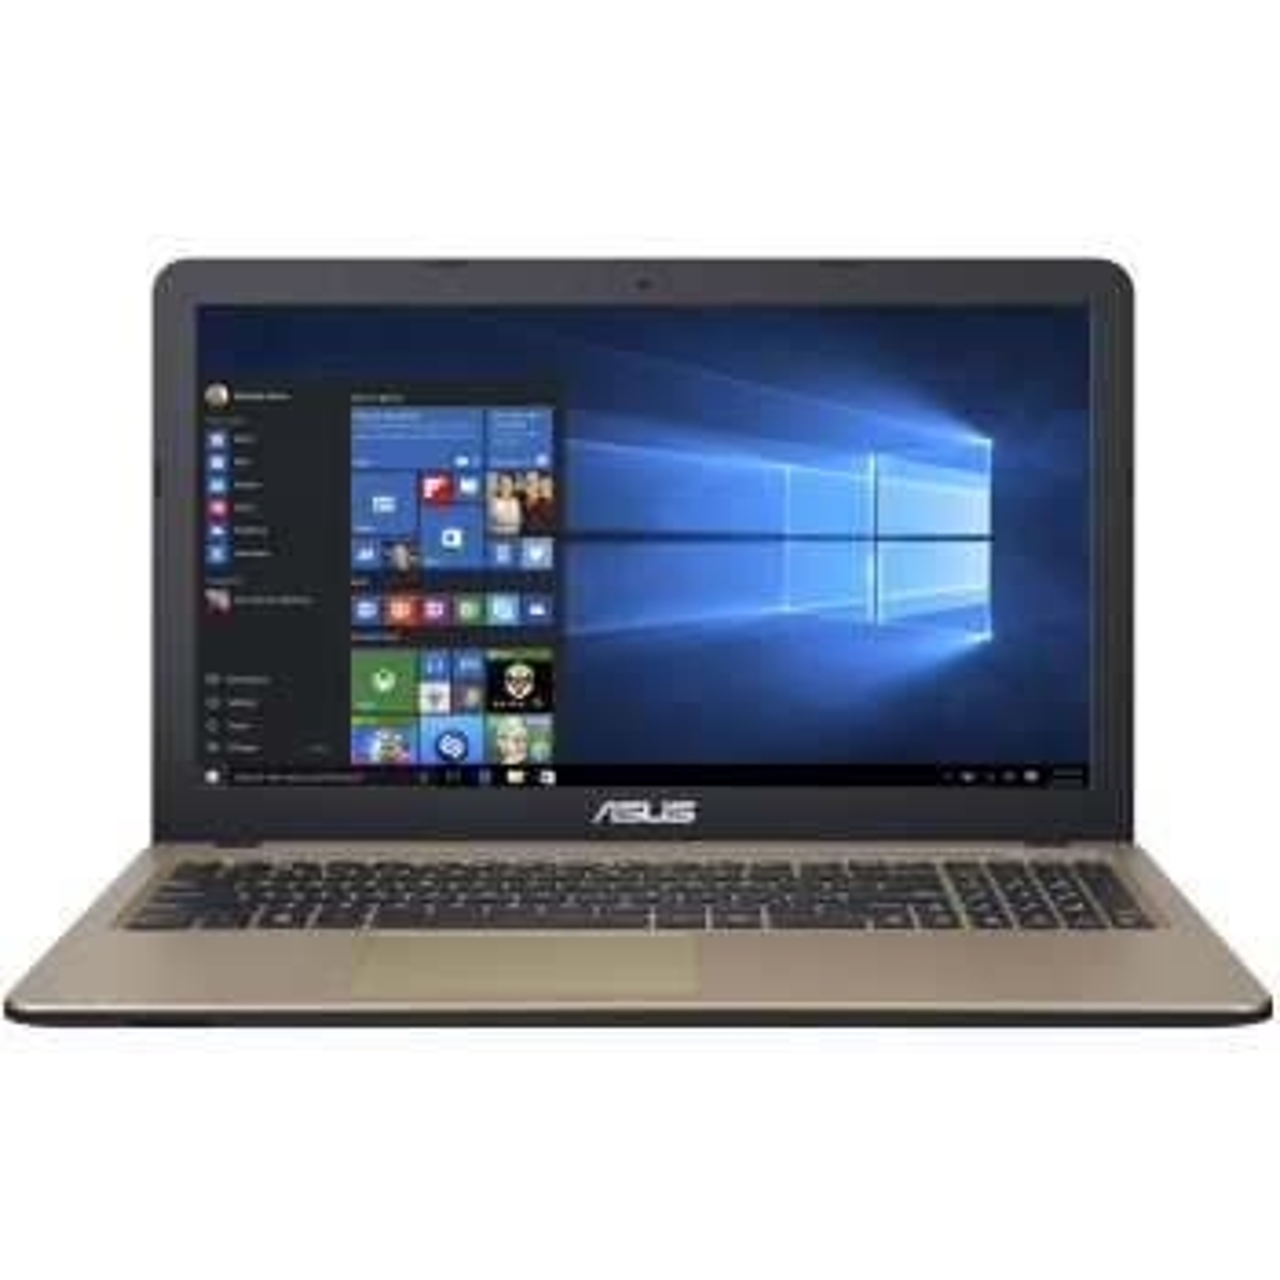 ASUS VivoBook X540YA   15 inch   AMD   4GB   500GB   512MB